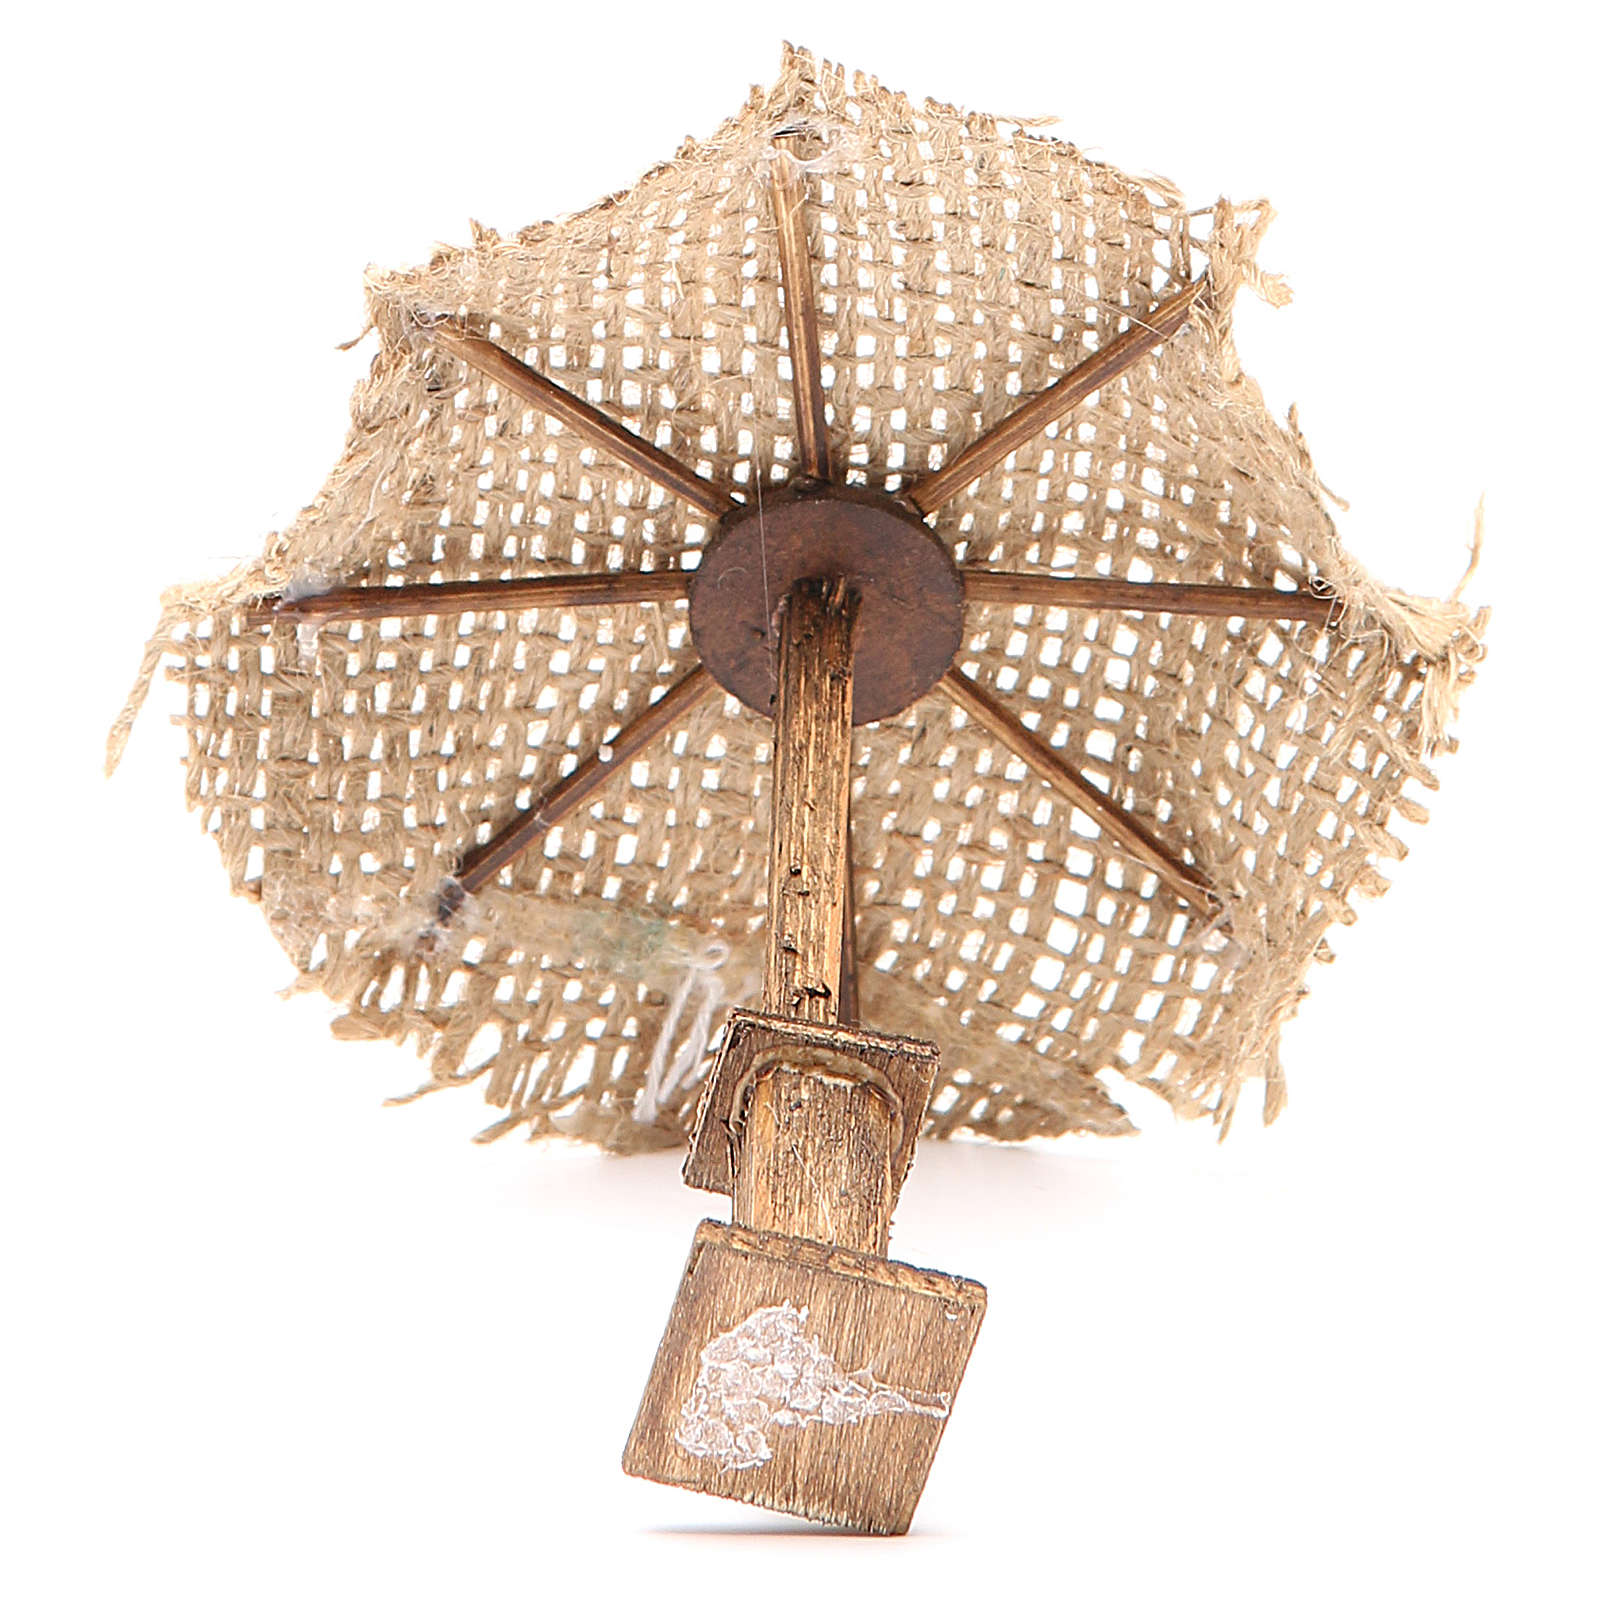 Ombrello juta per presepe 12X10X10 cm 4